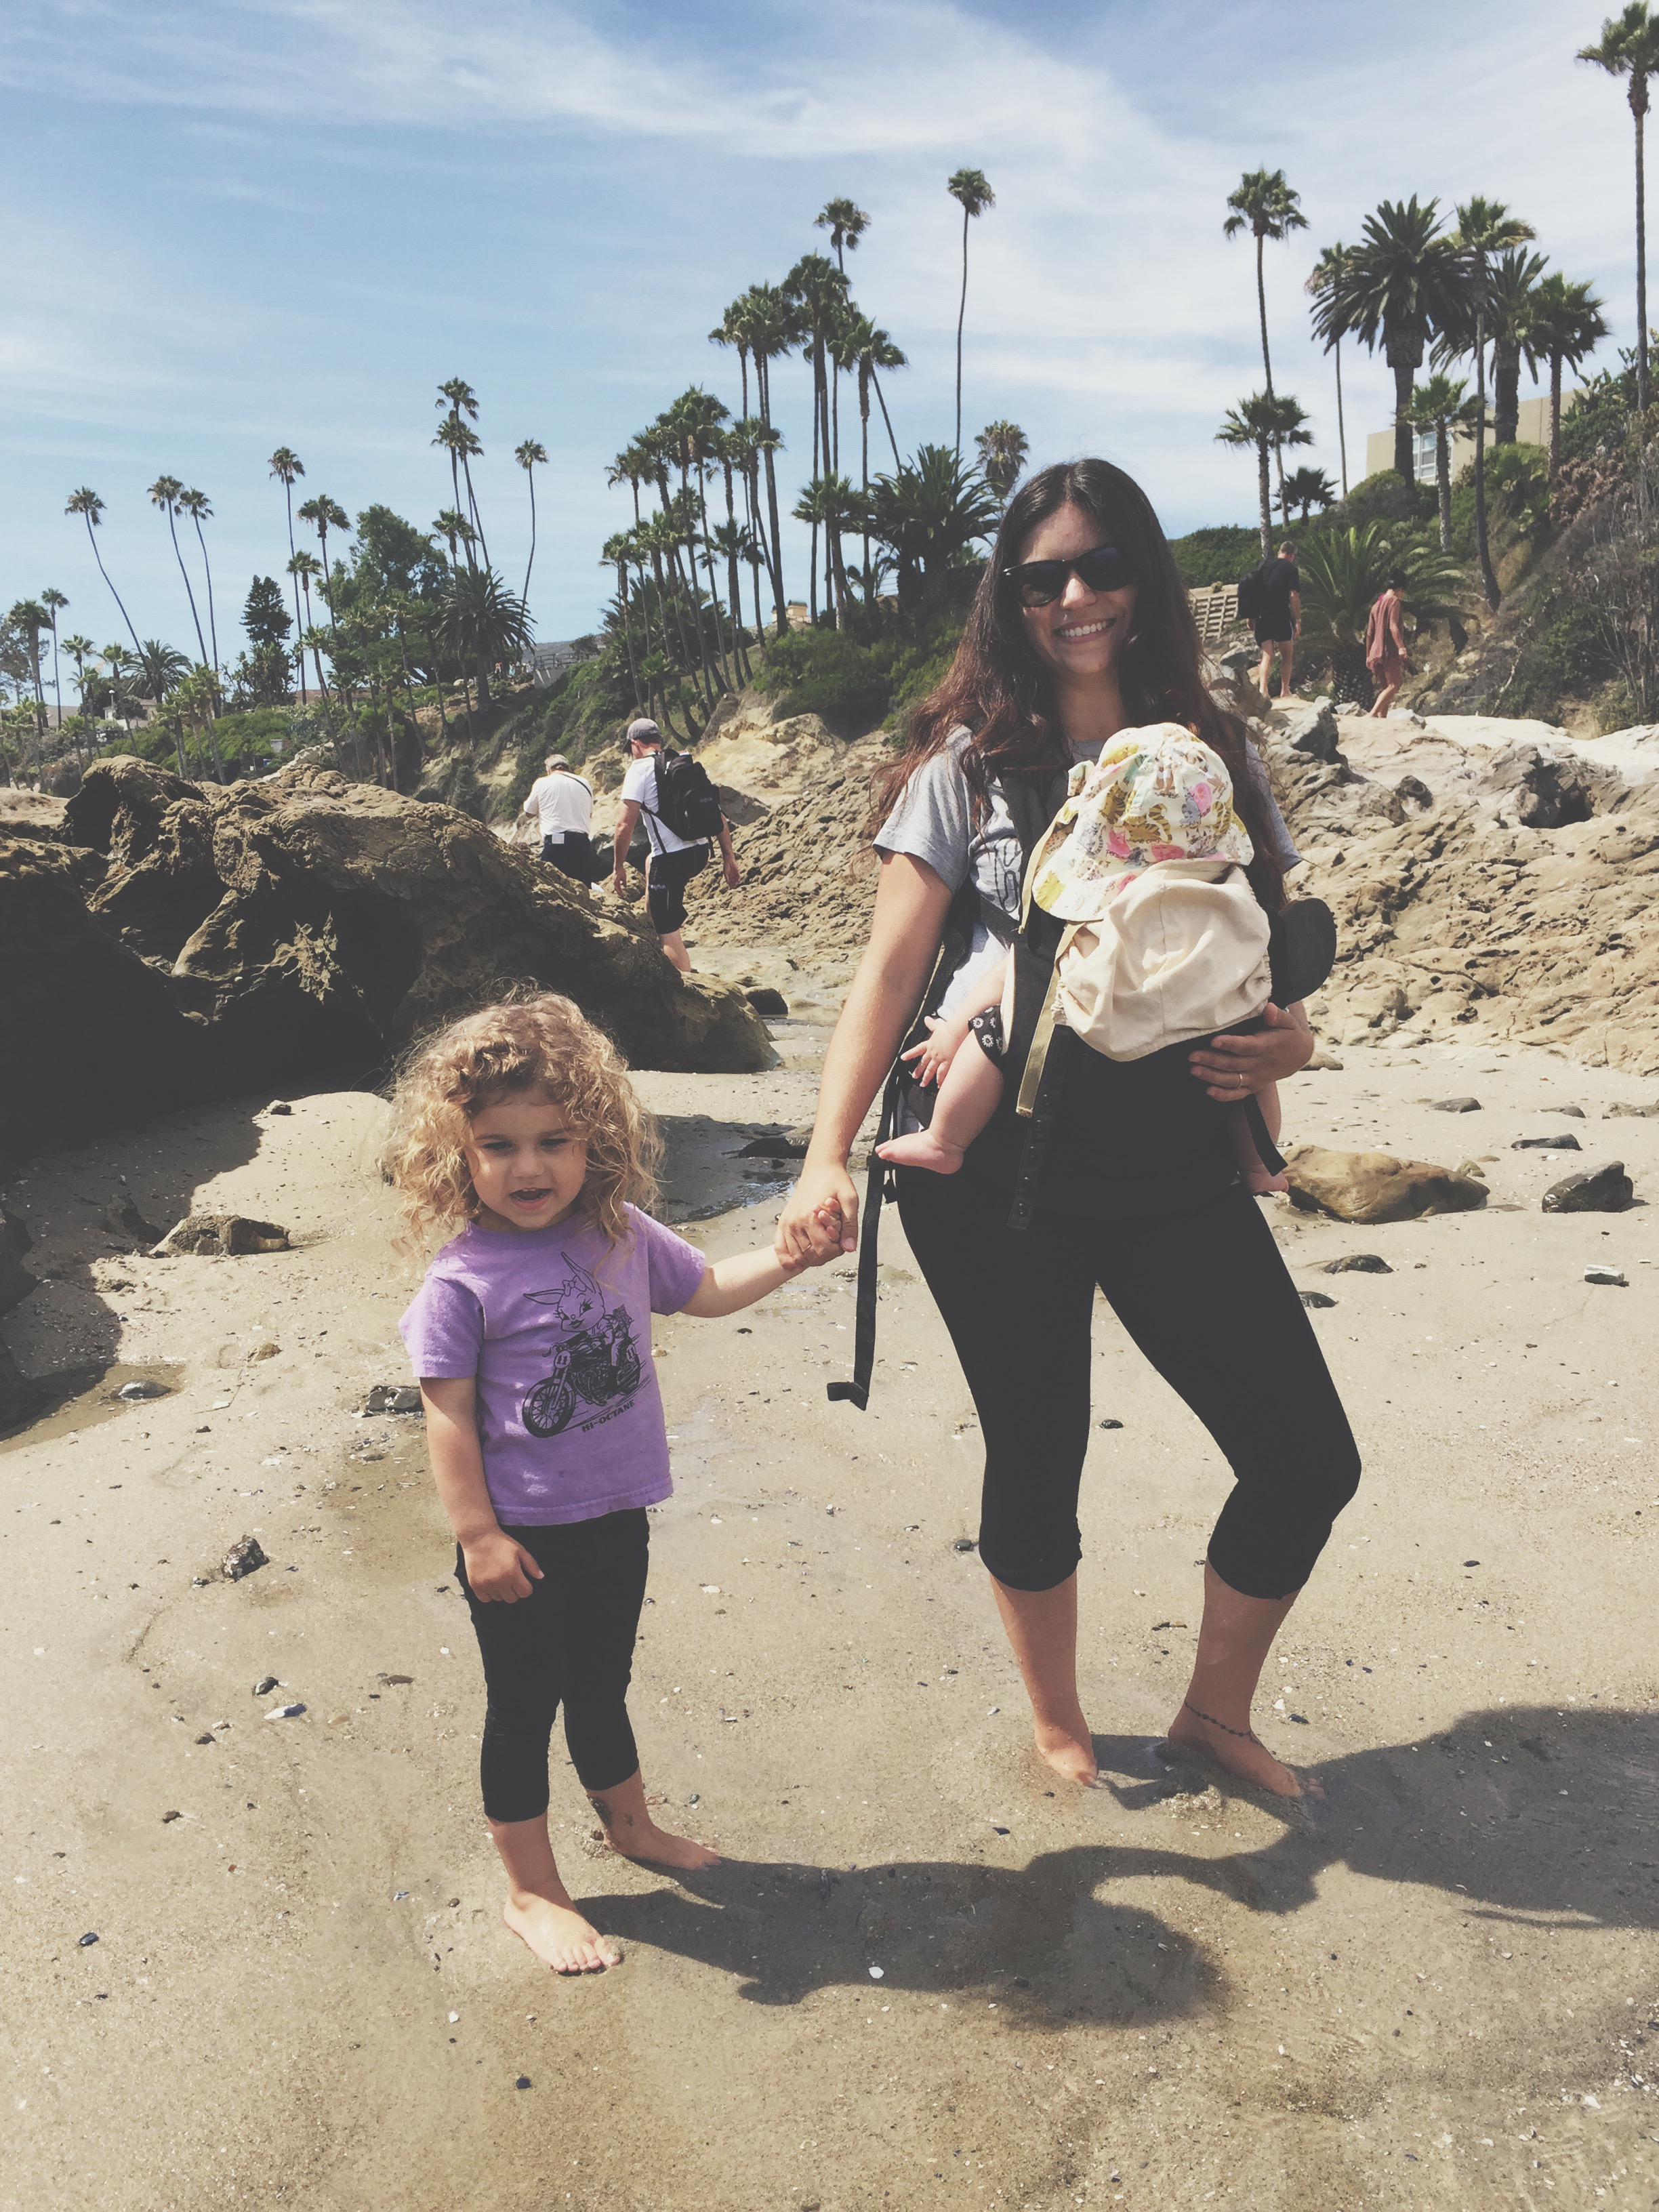 laguna beach with baby in ergo